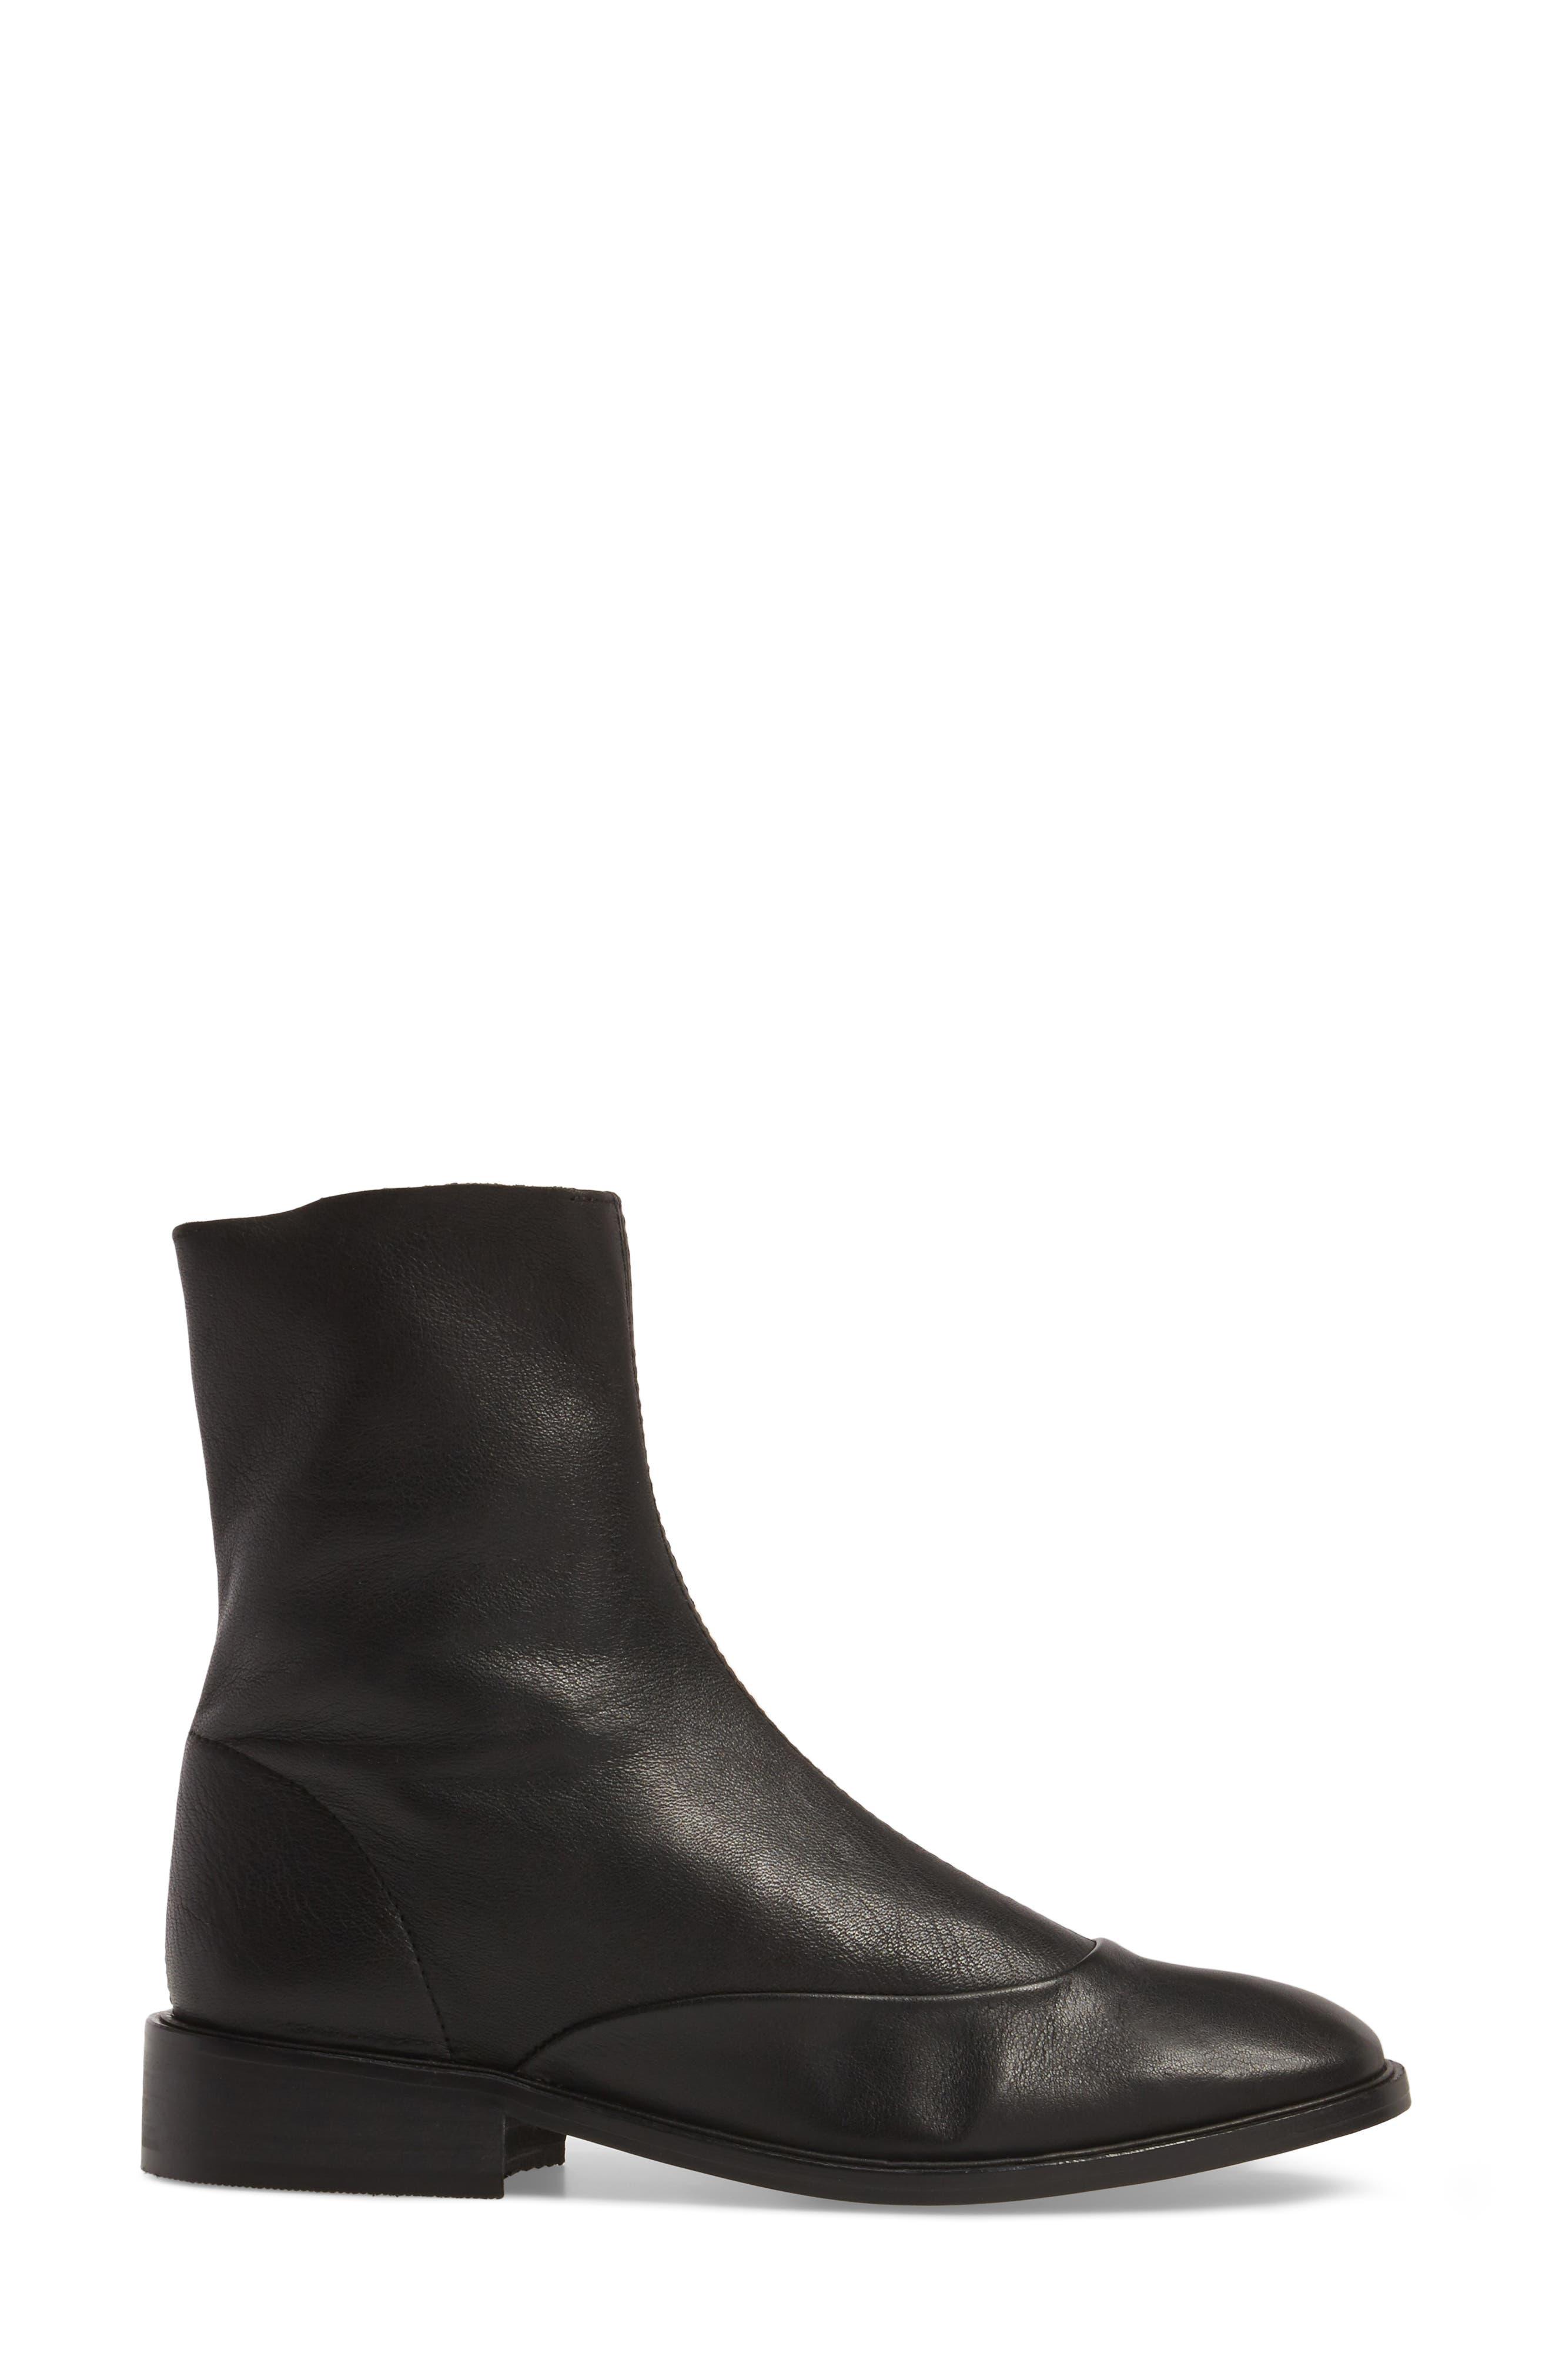 April Sock Boots,                             Alternate thumbnail 3, color,                             001